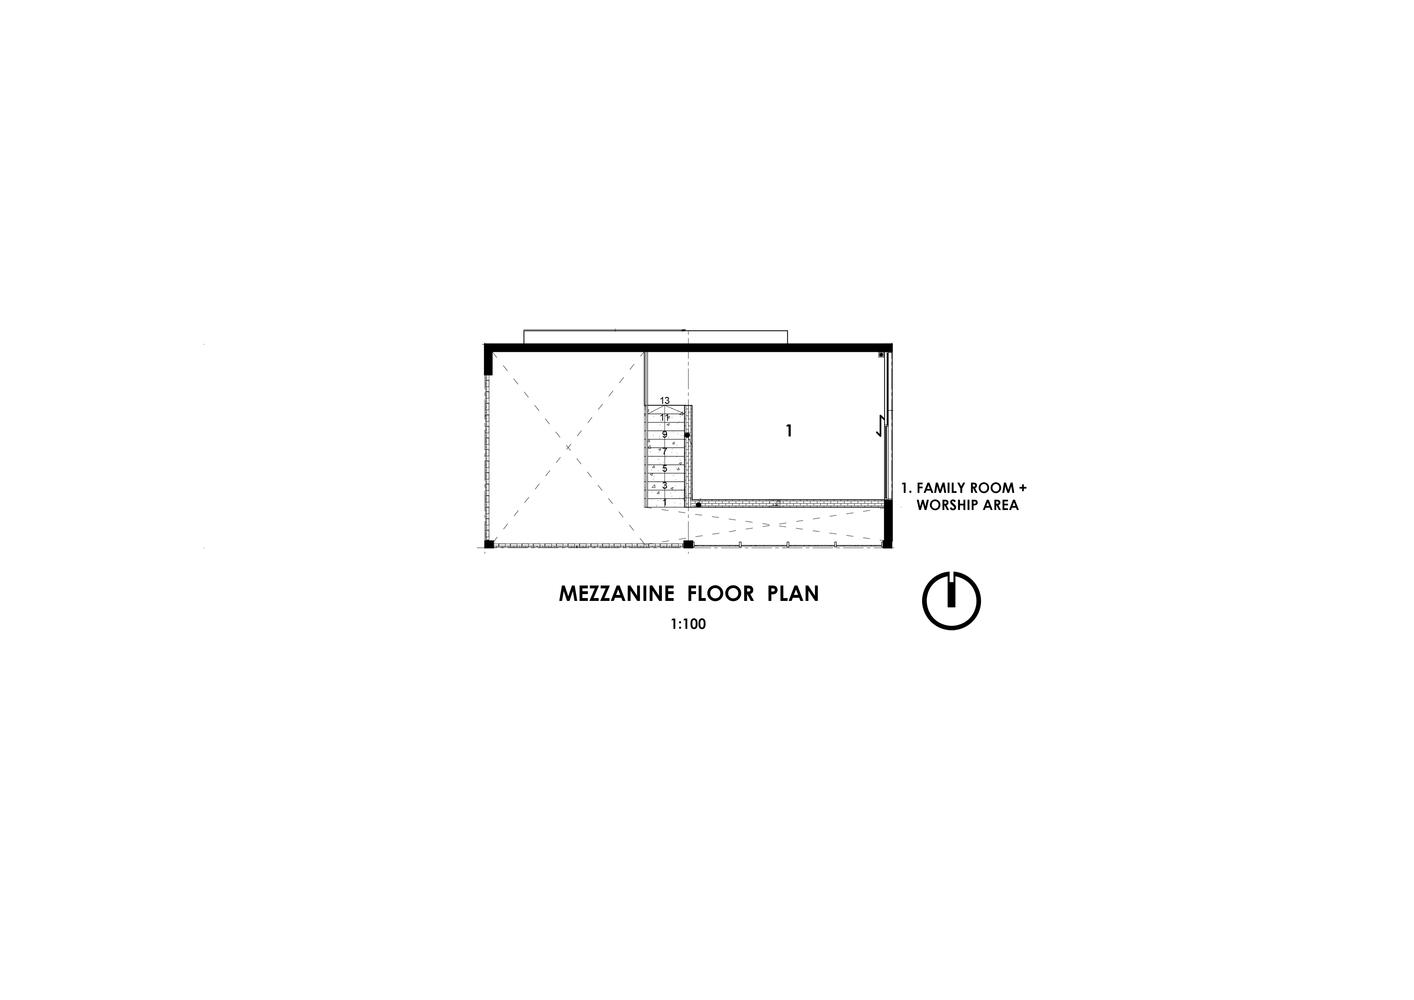 C:UsersRUCHIDocuments20190312_KITE HOUSE.pdf